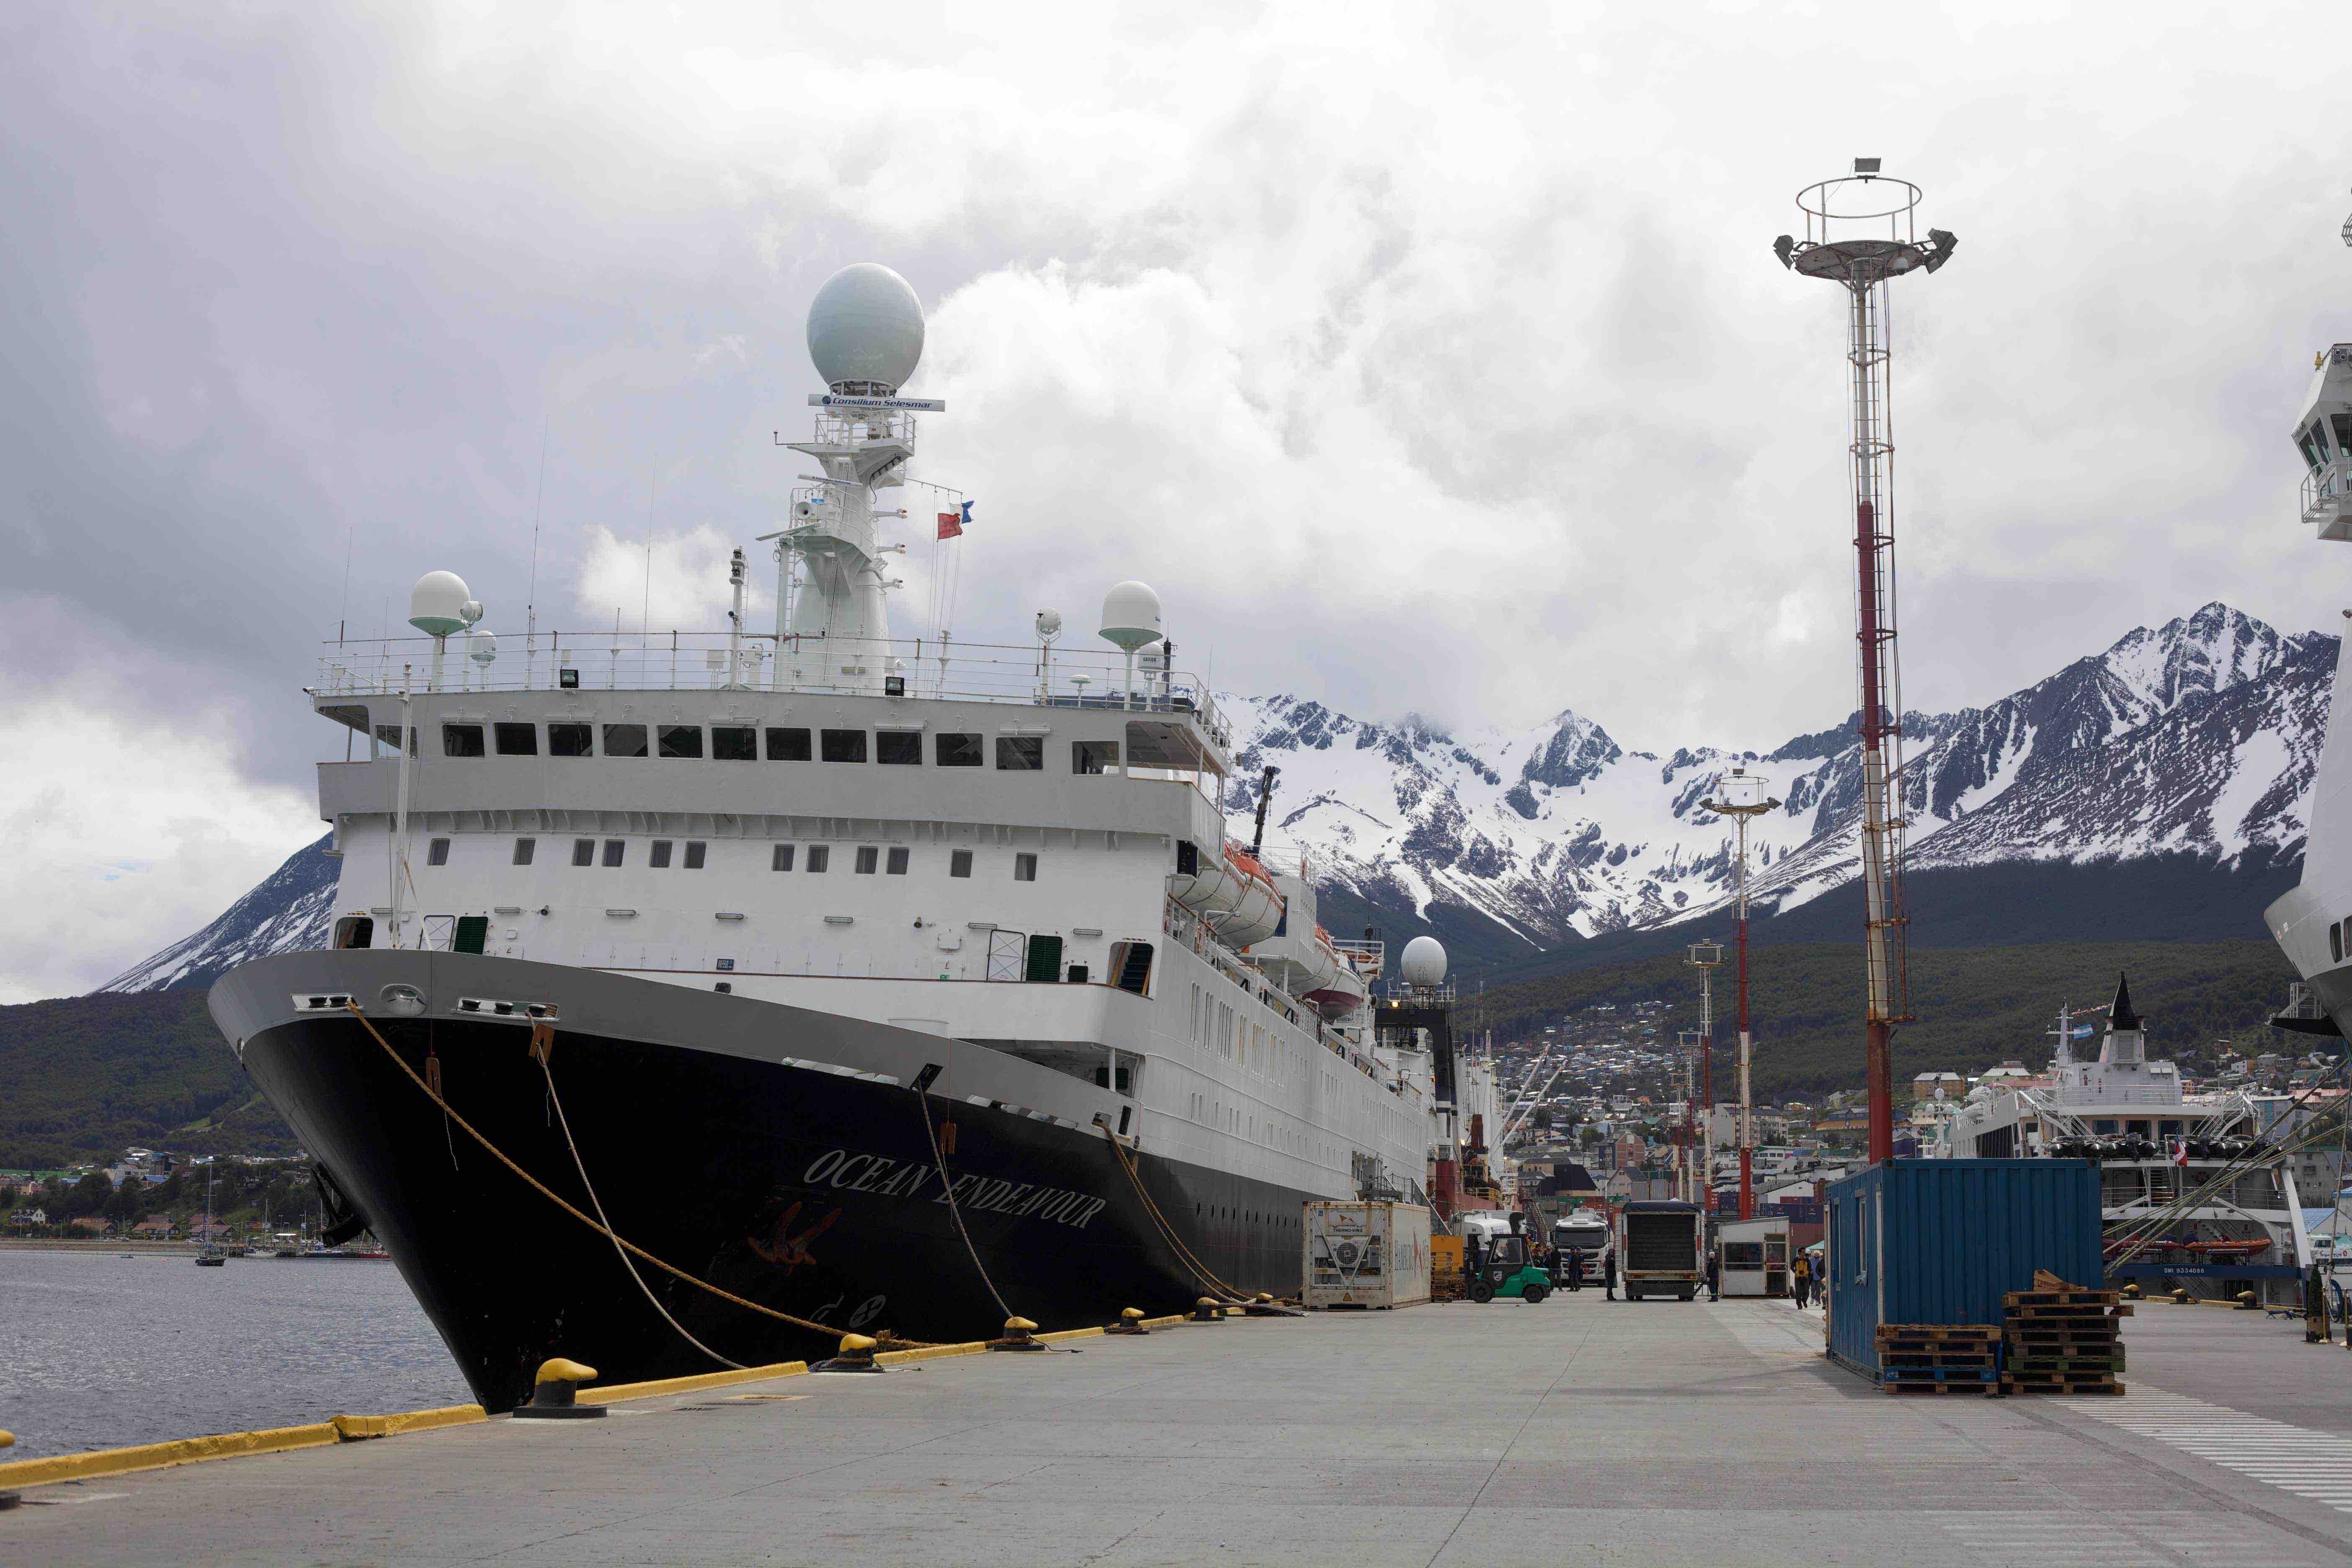 Ocean Endeavour in Ushuaia